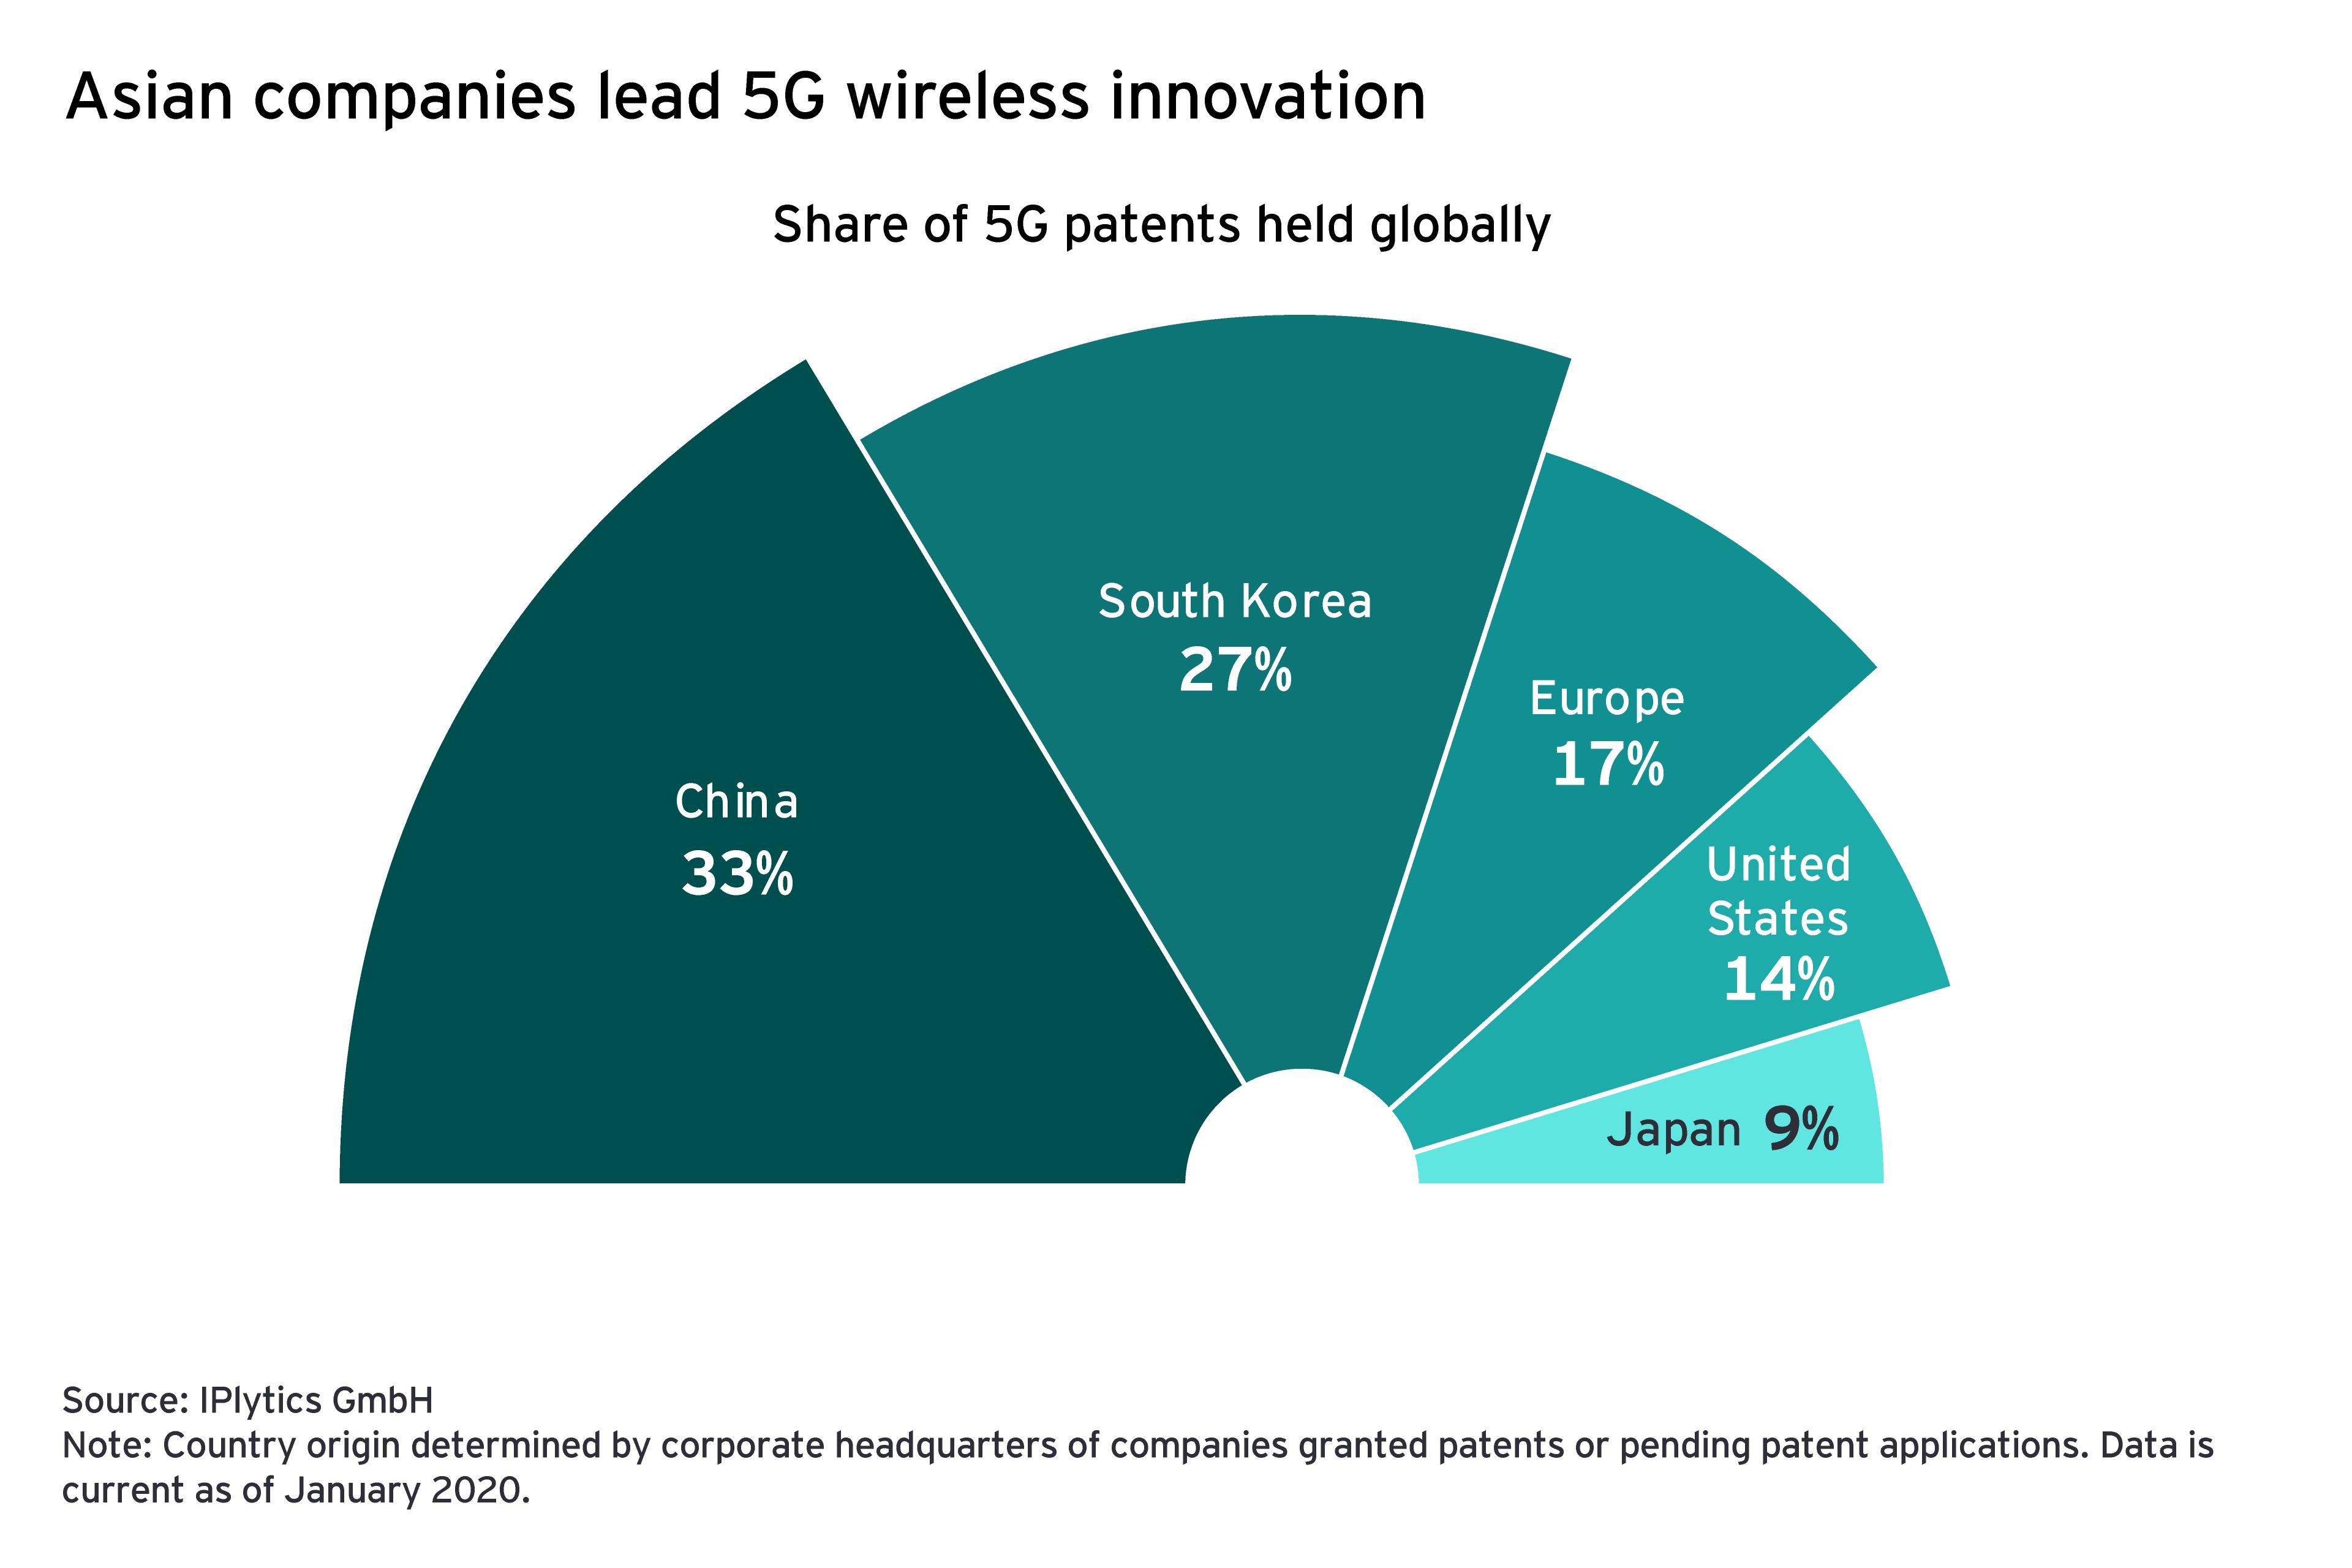 Asian companies lead 5g wireless innovation